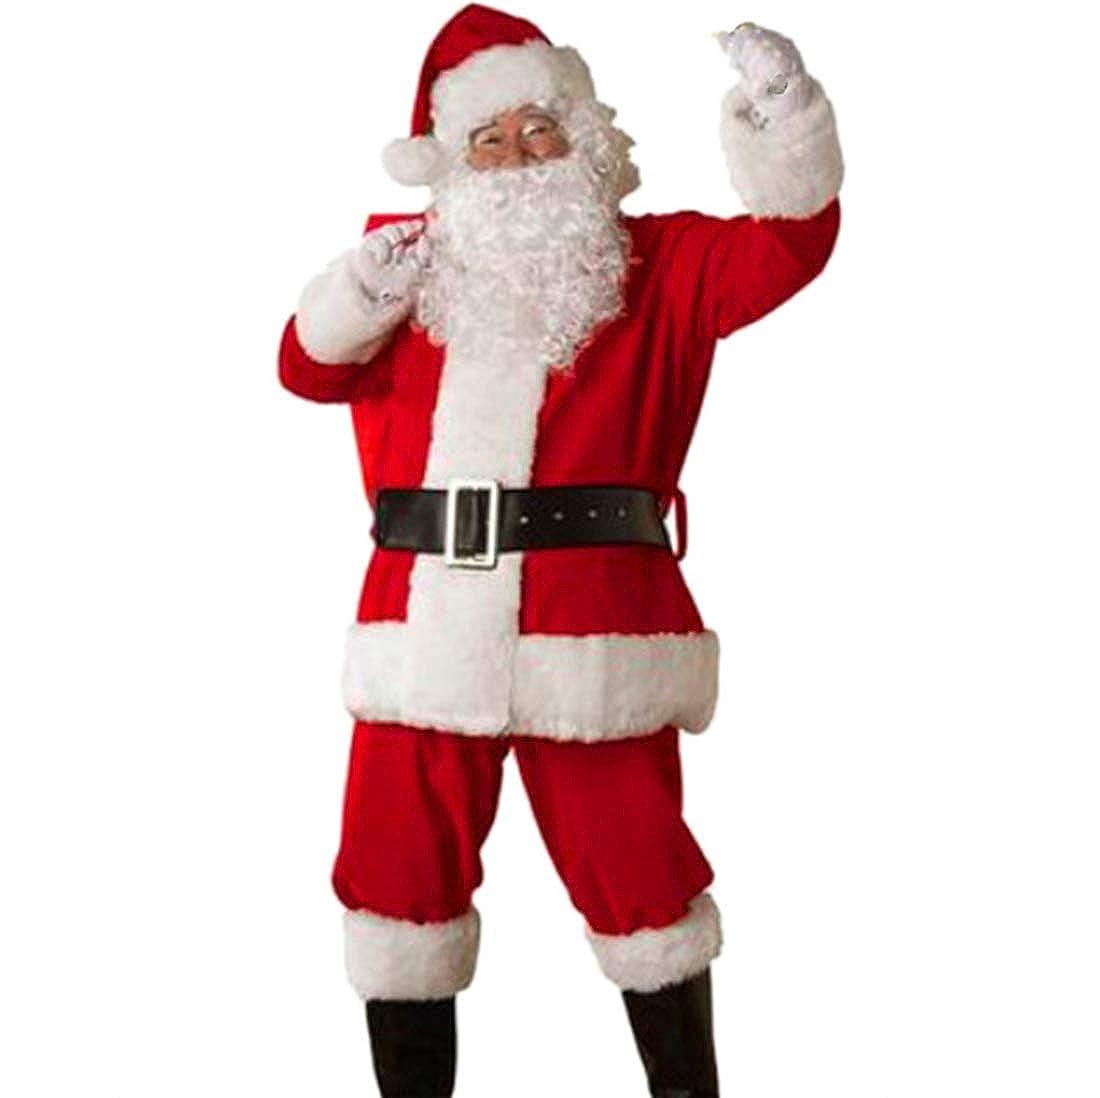 5Pcs Christmas Santa Claus Outfit Set - Mens Tops Pants Suit Belt Hat Santa Deluxe Set Holiday Costume Cosplay Clothing Aritone Men Coat